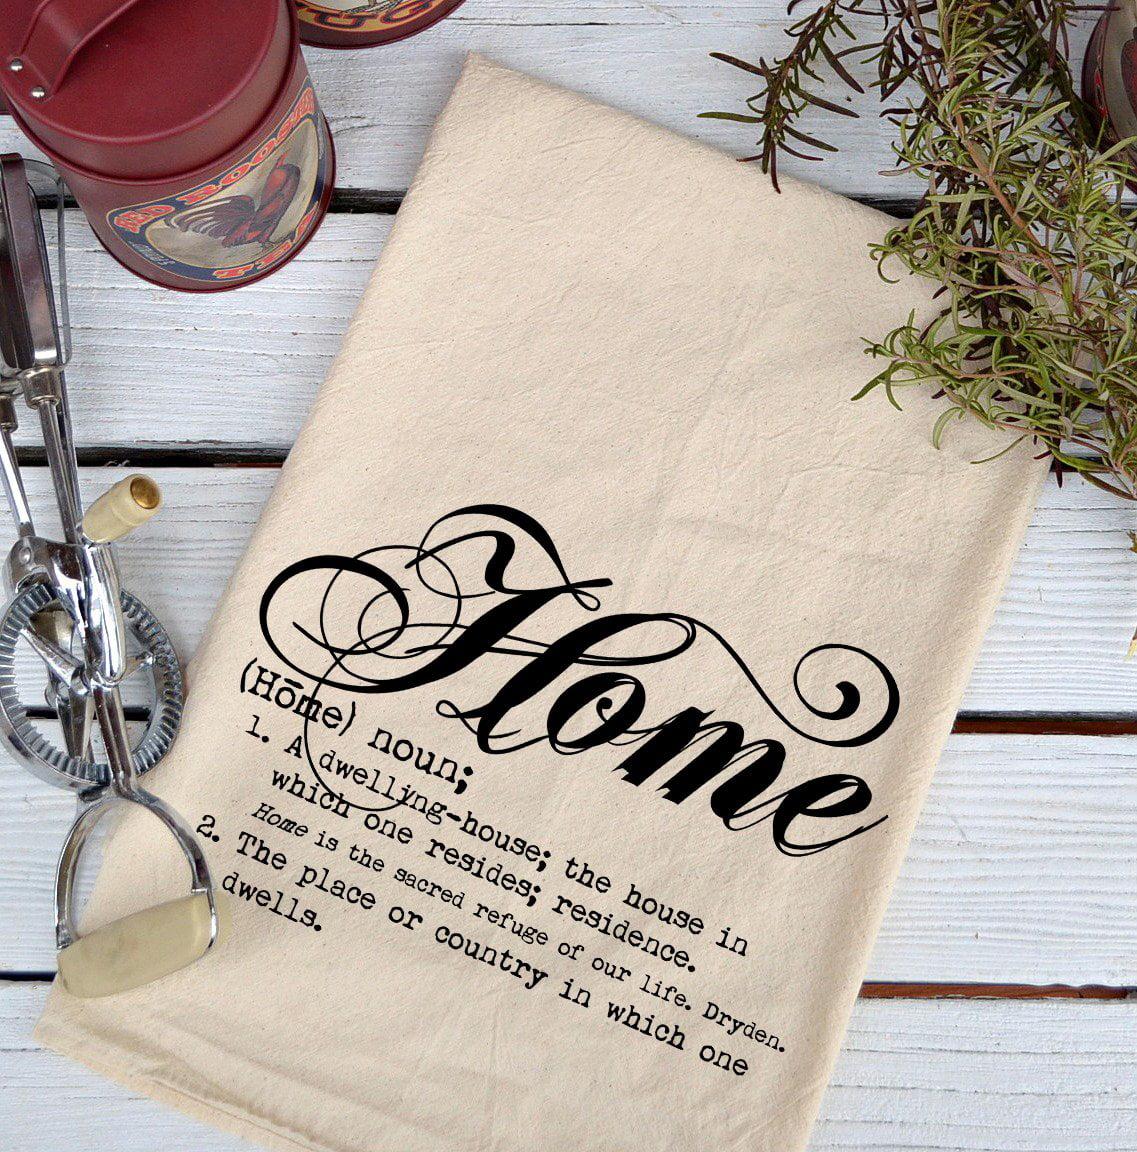 Farmhouse Natural Flour Sack Definition Home Script Country Kitchen Towel by